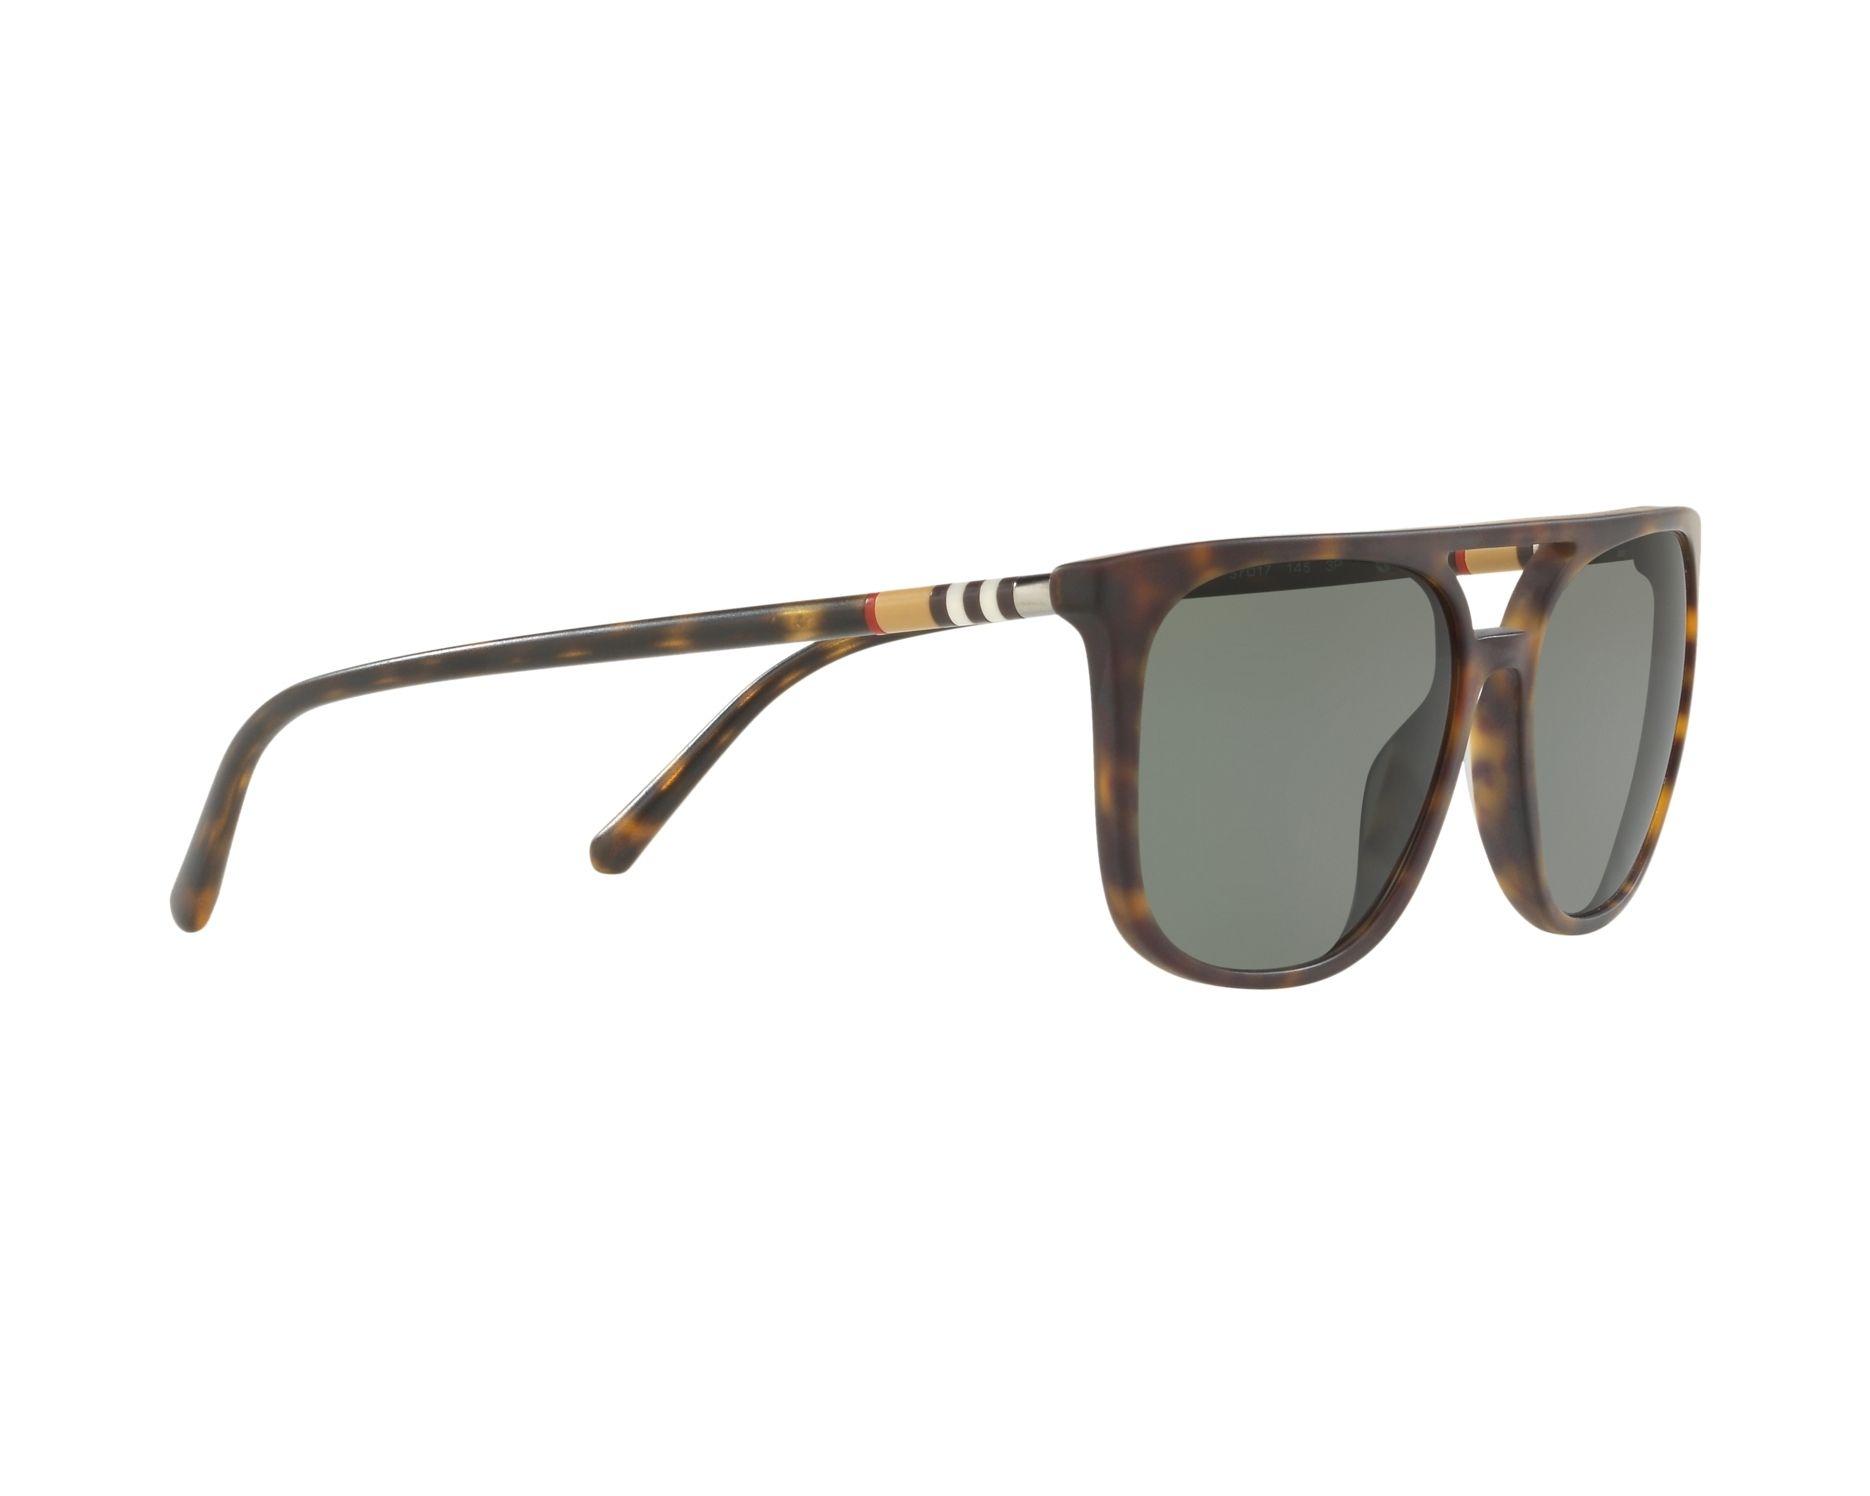 fed7e845639 Sunglasses Burberry BE-4257 35369A 57-17 Havana 360 degree view 11